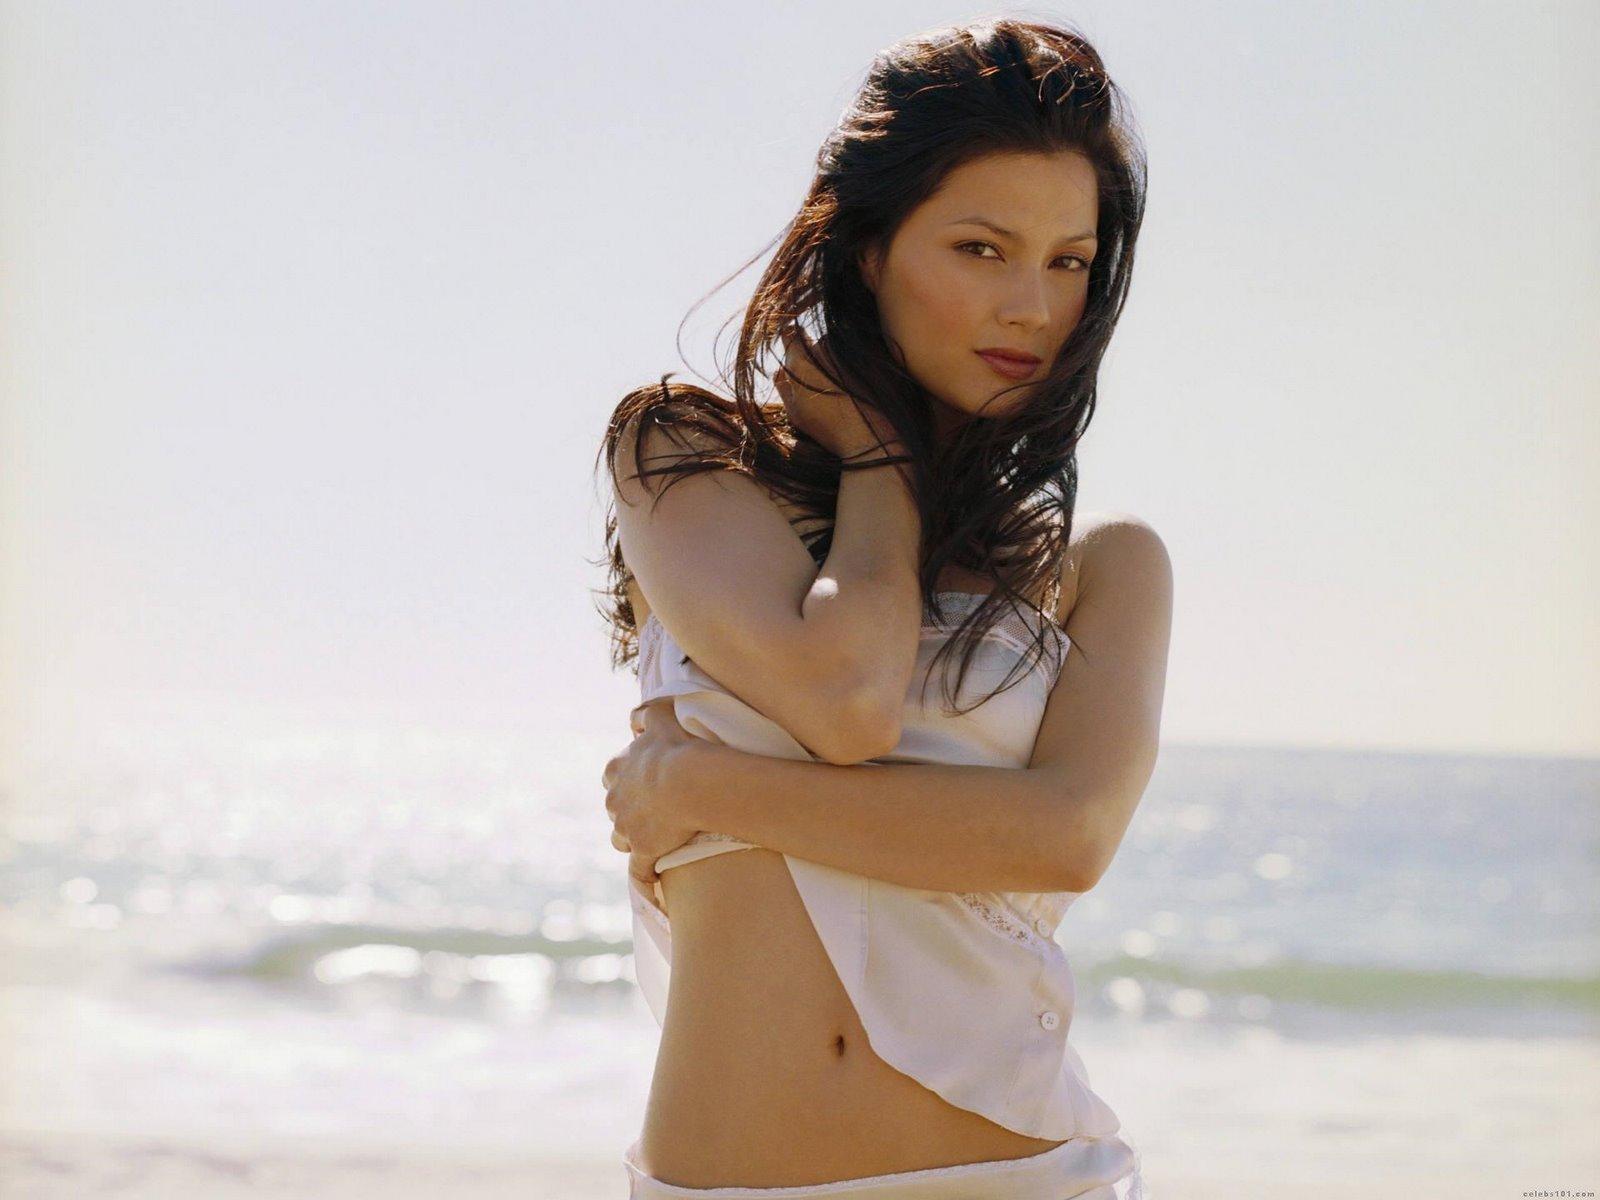 Nathalie kelley movie boobs sex